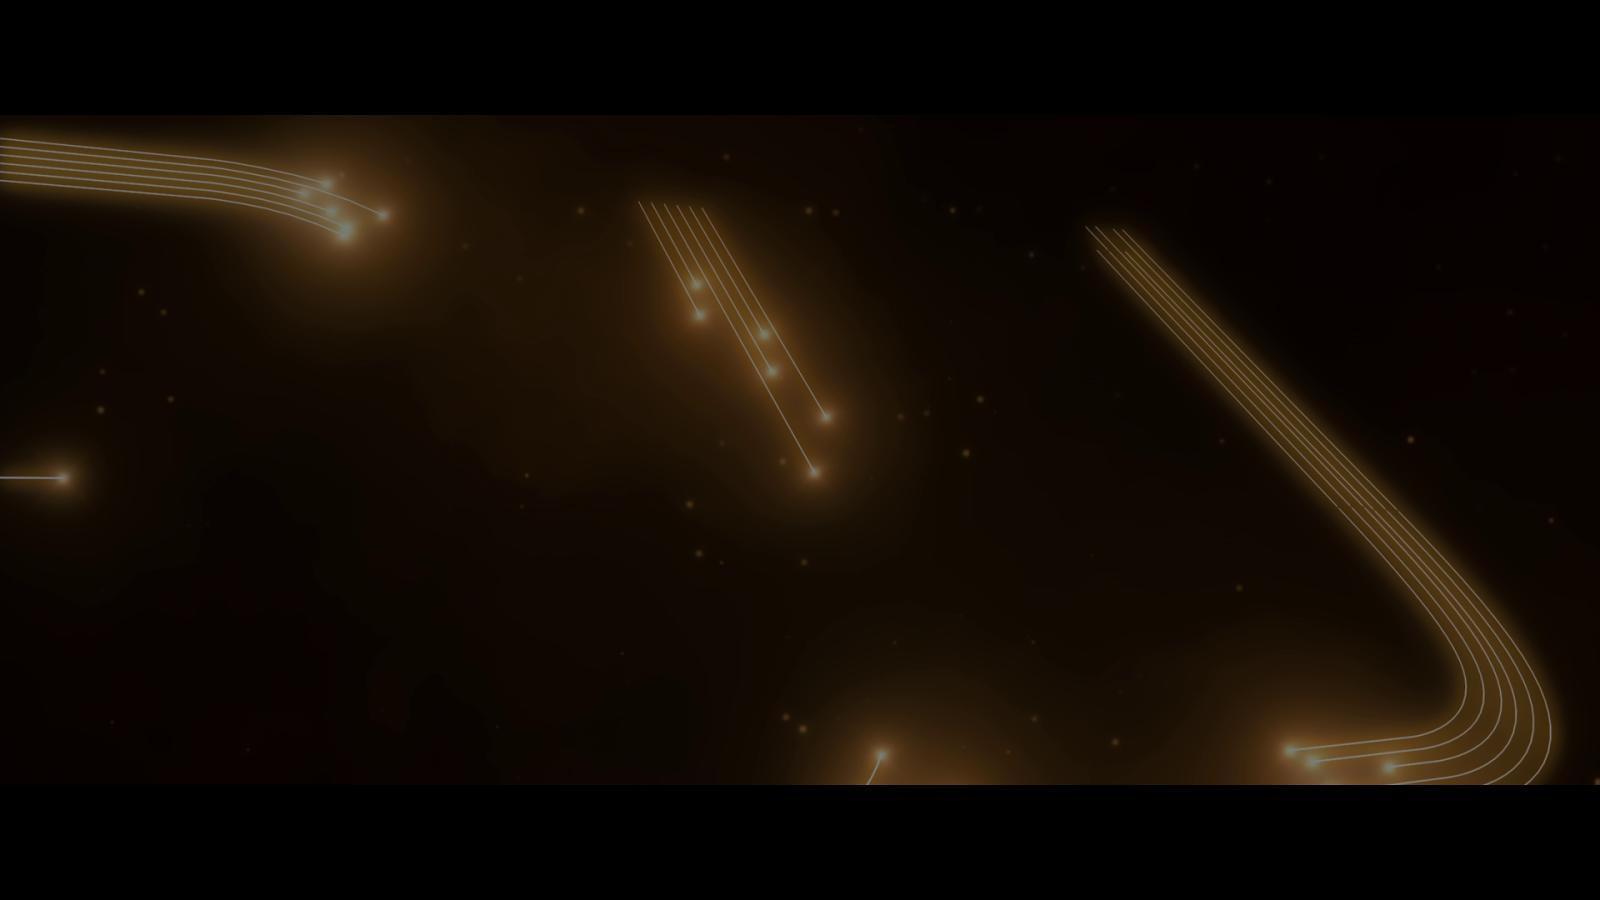 La LLegada (2016) 1080p BD25 LATINO 2